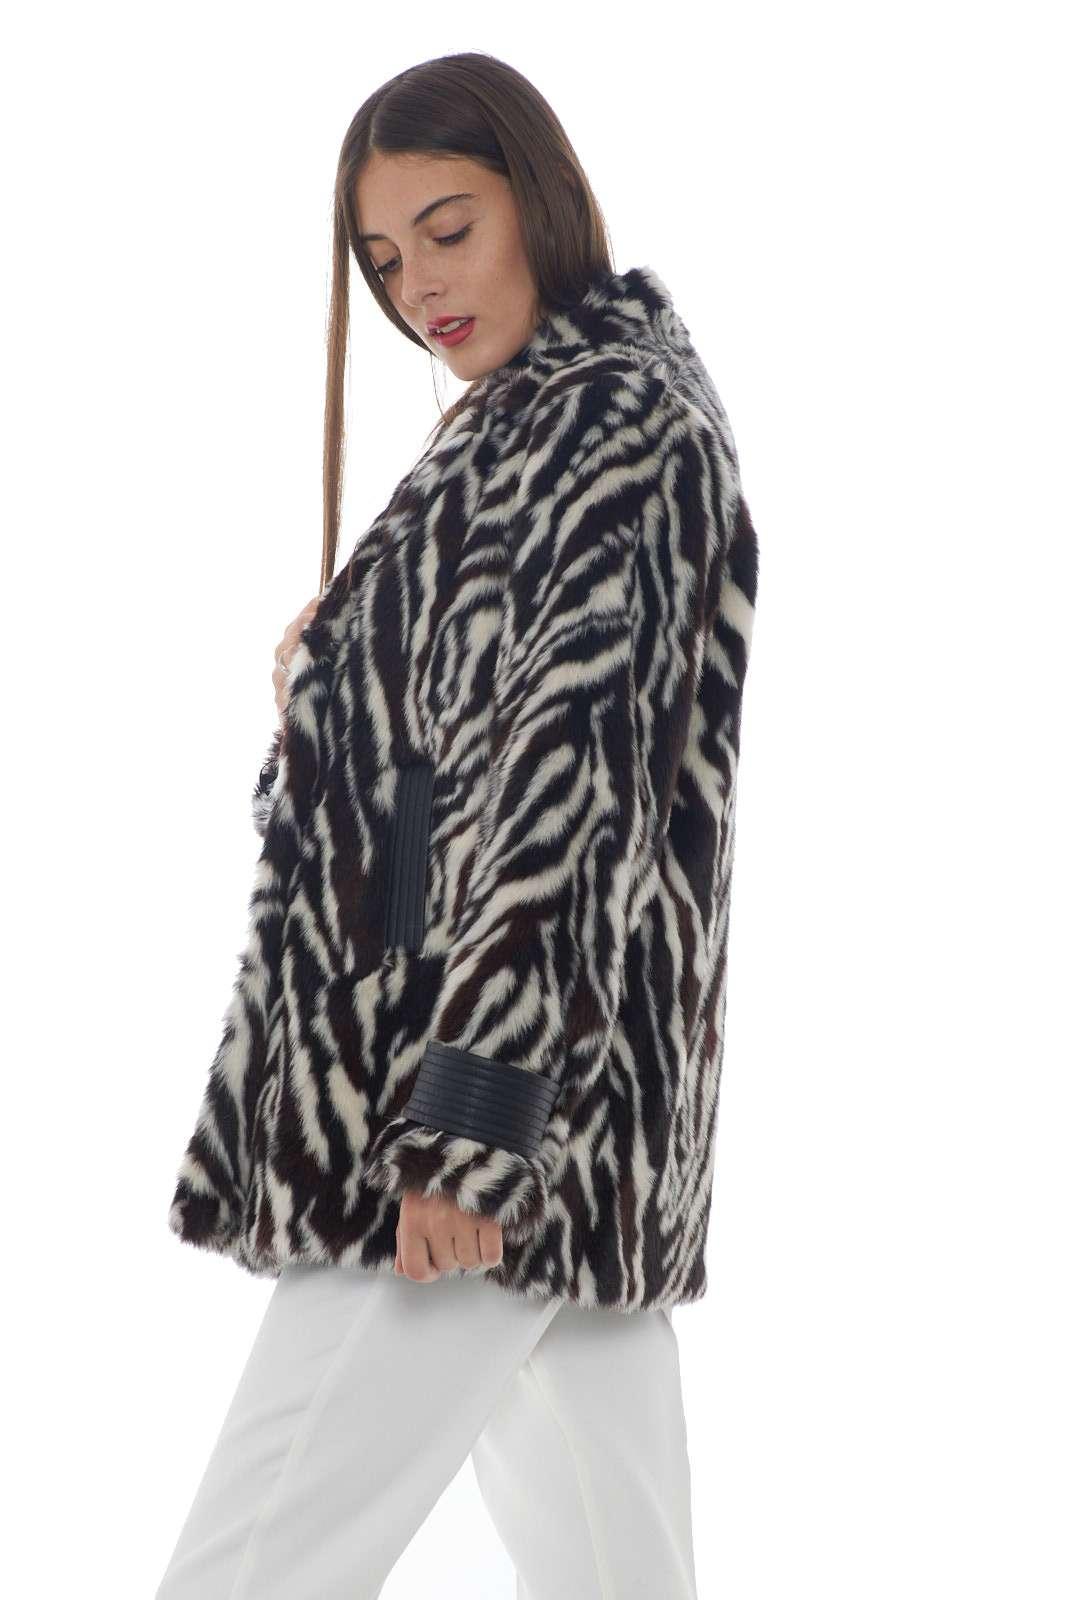 https://www.parmax.com/media/catalog/product/a/i/AI-outlet_parmax-pelliccia-donna-Pinko-1g146m-B.jpg